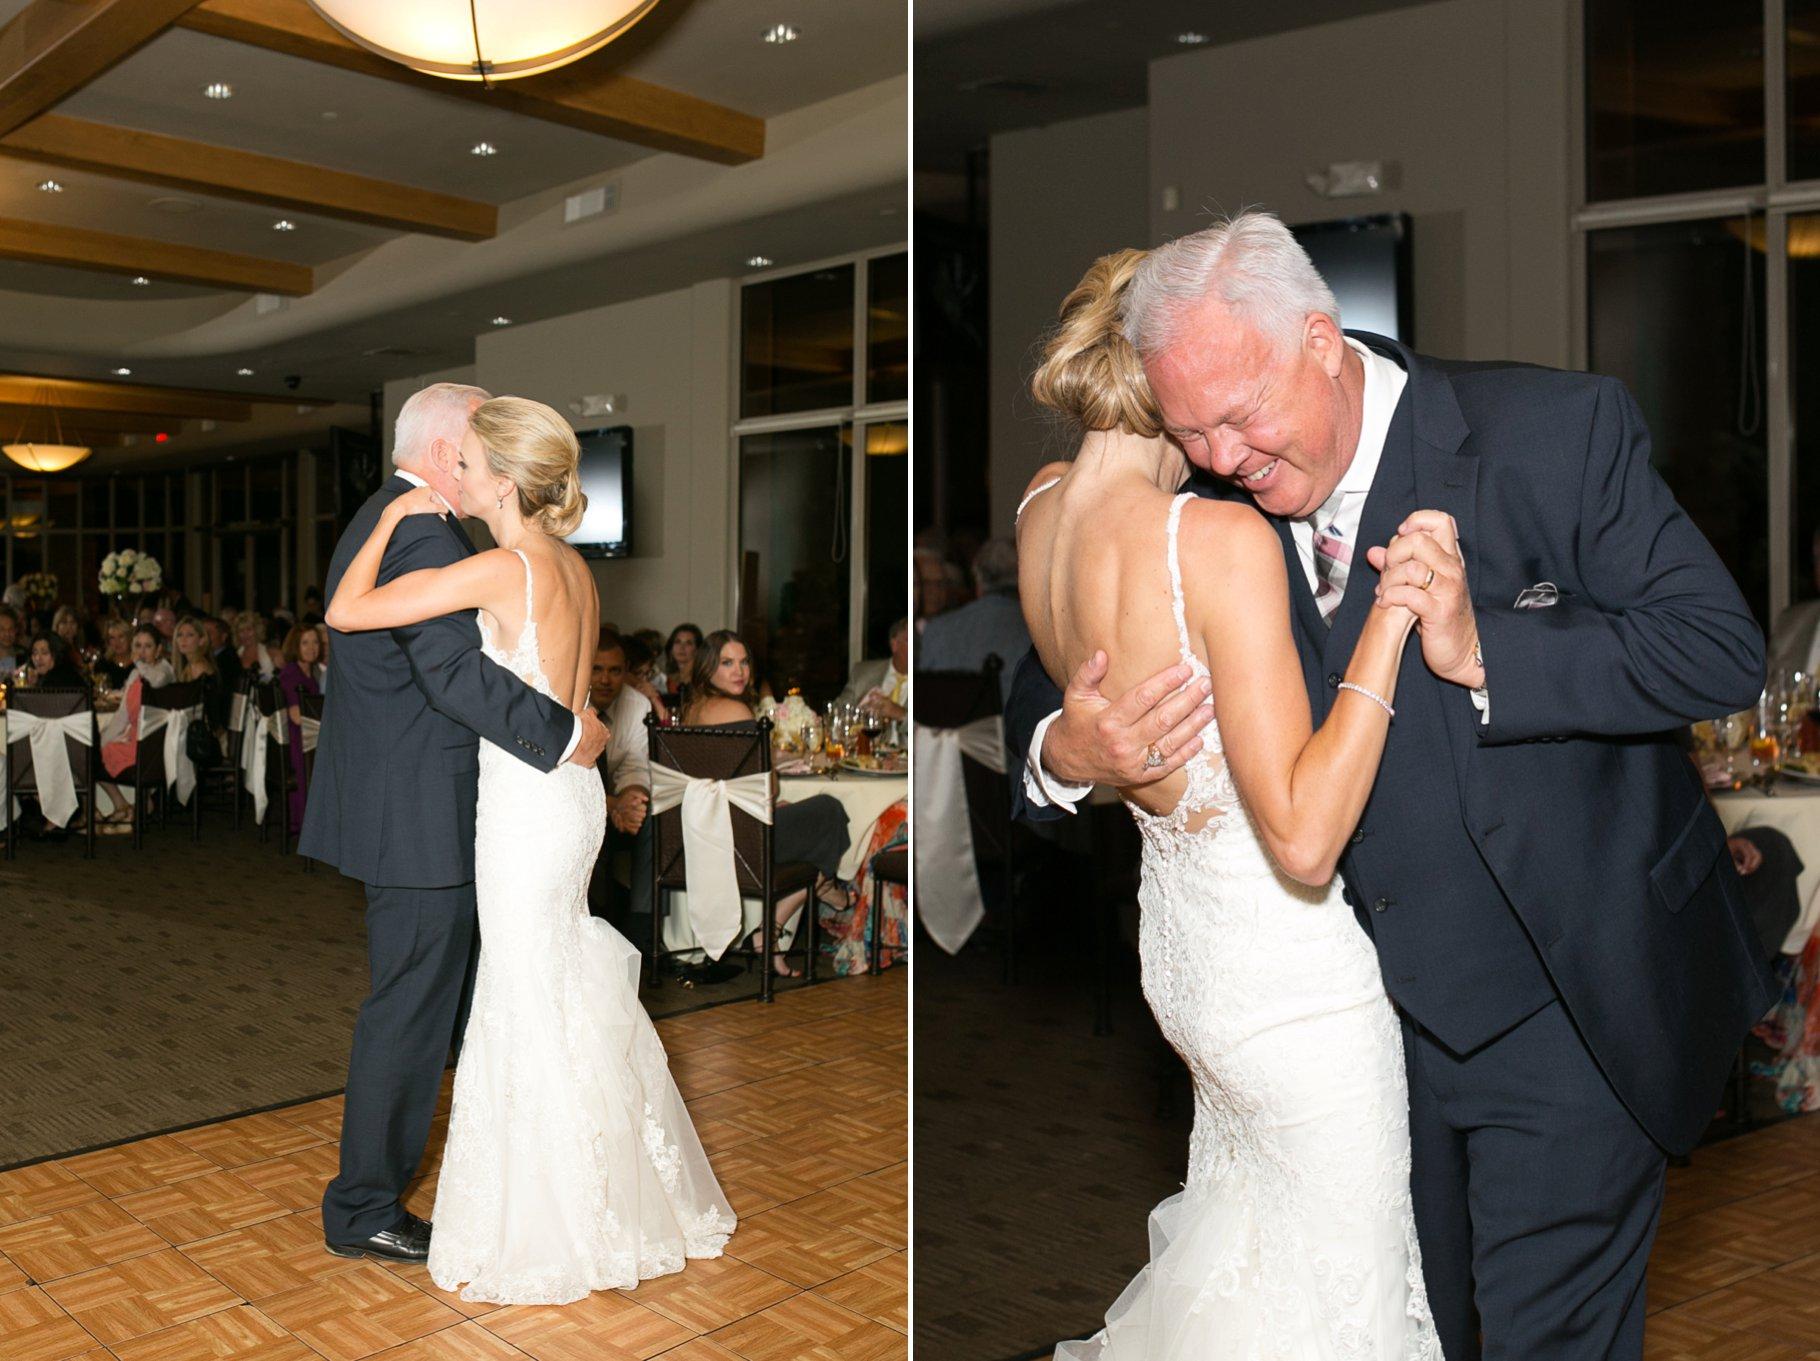 sedona wedding-603_GRETCHEN WAKEMAN PHOTOGRAPHY.jpg